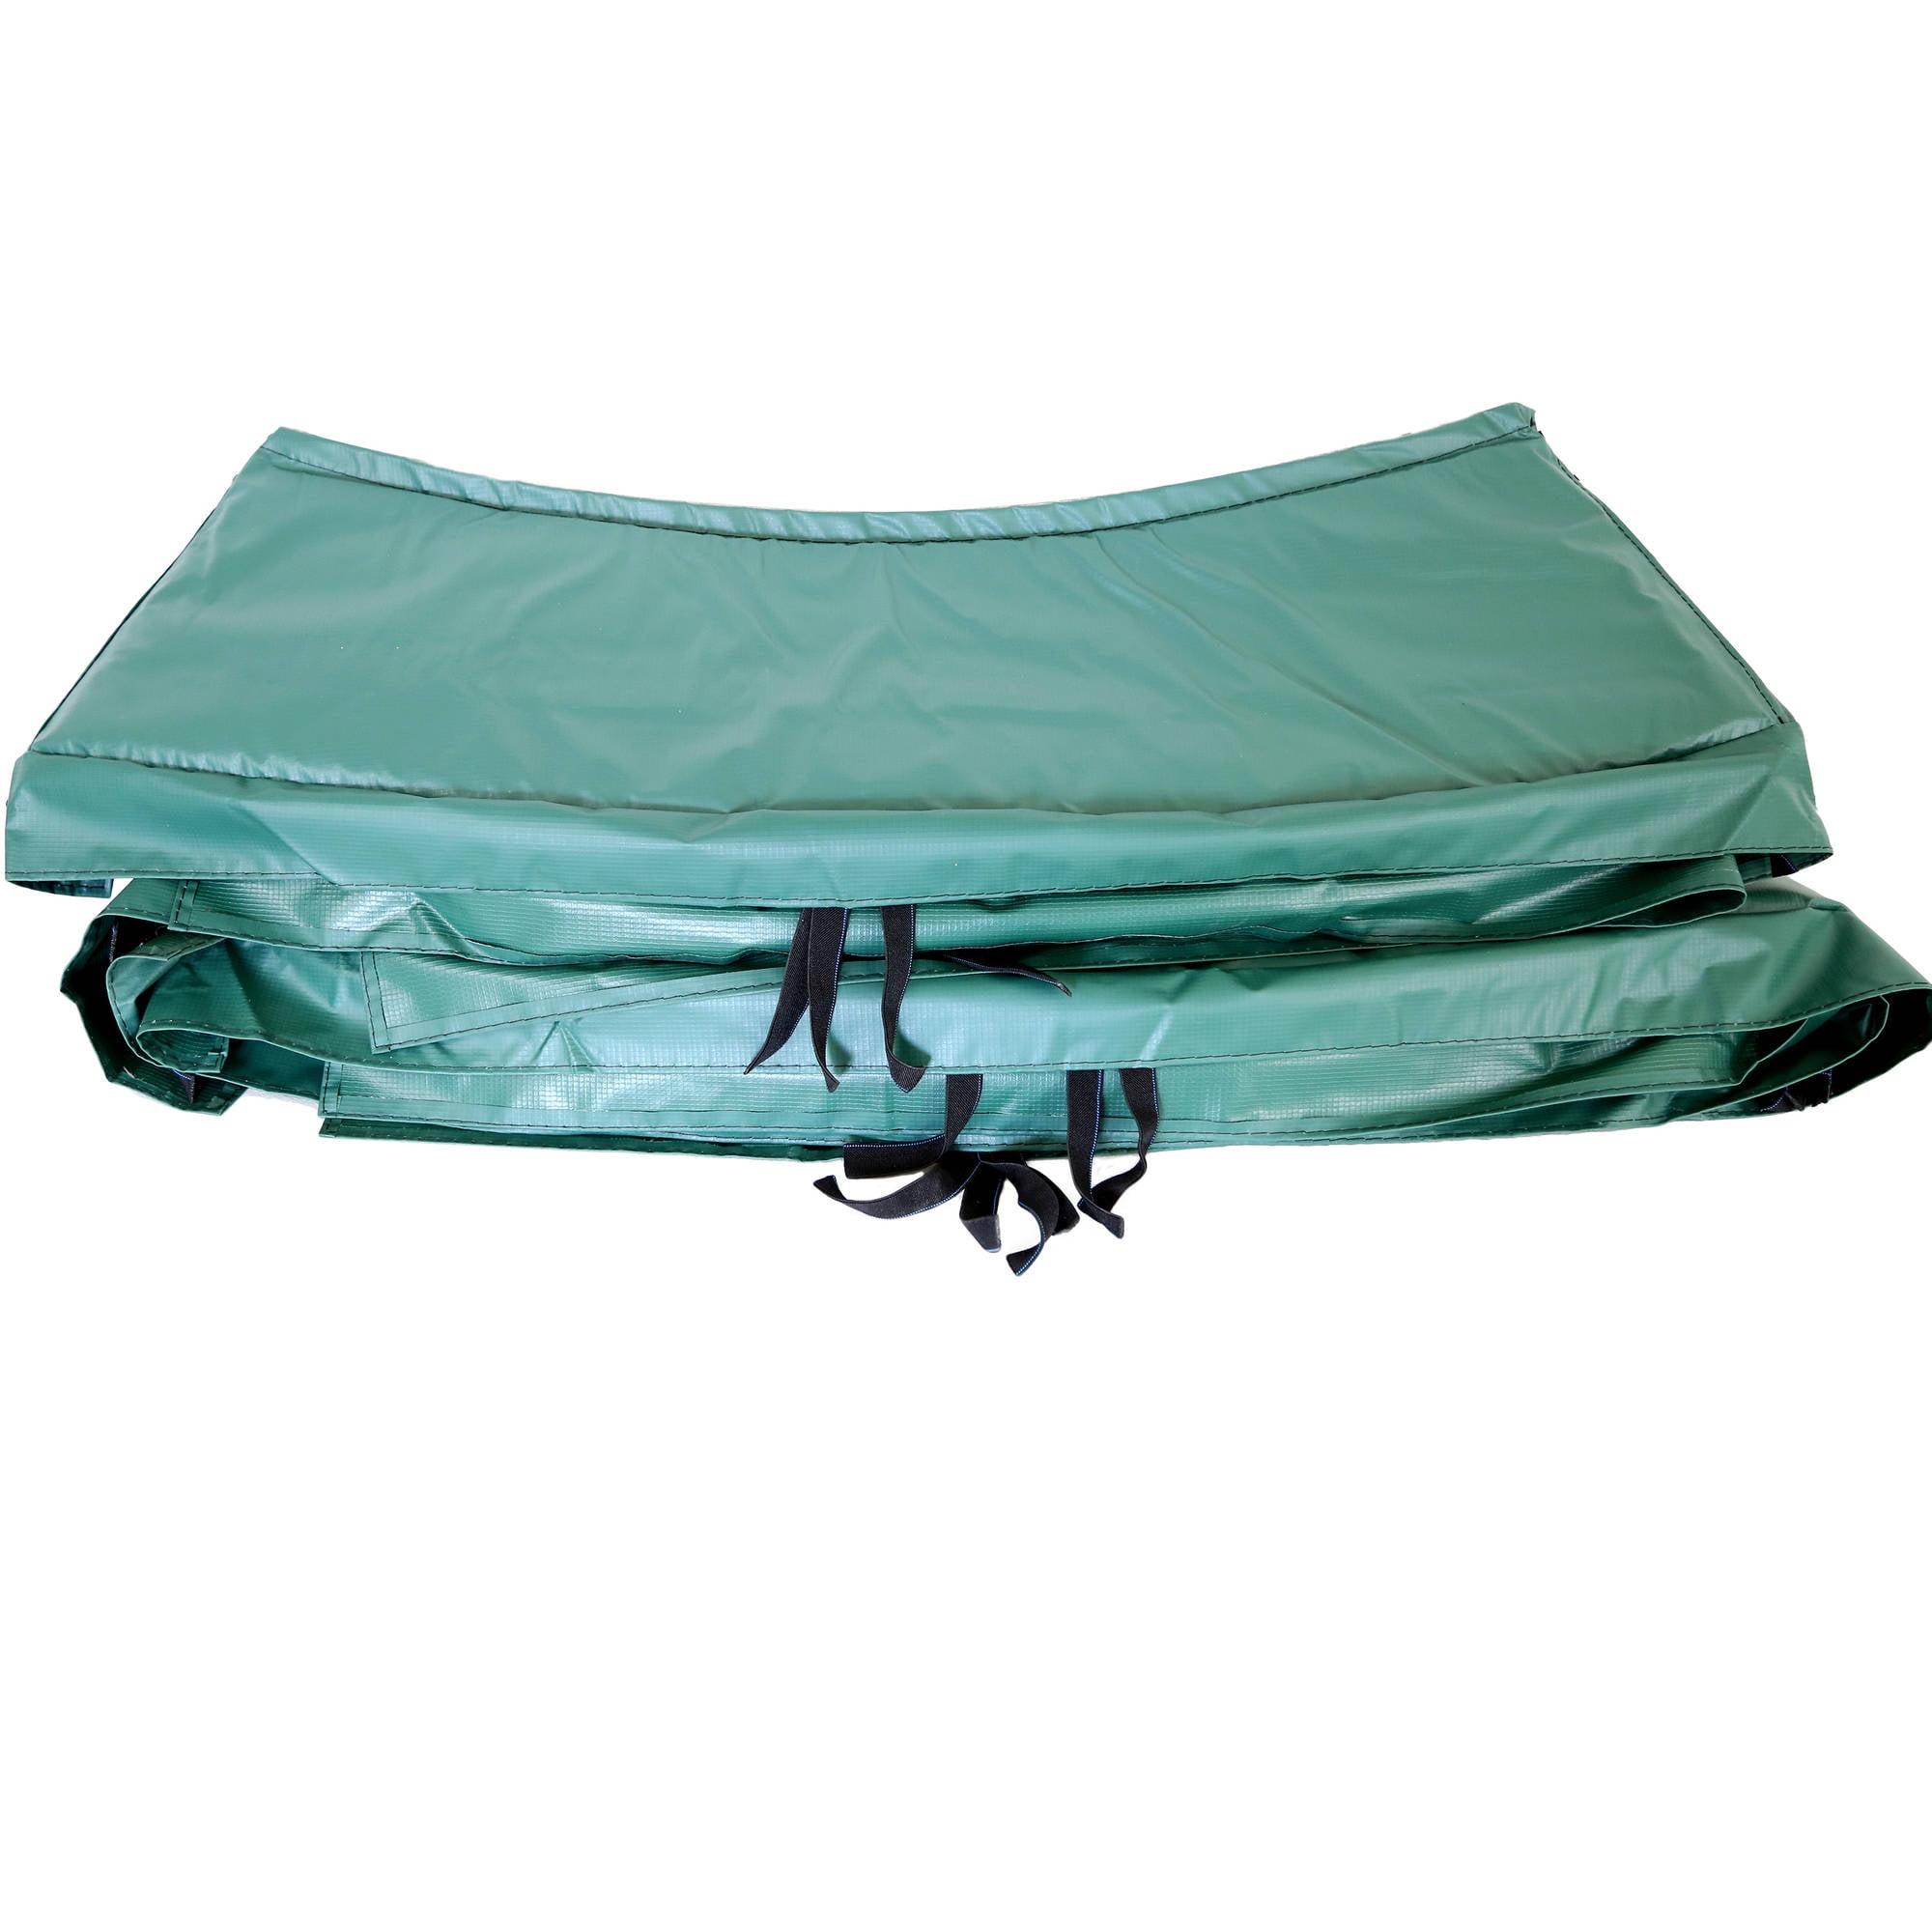 Skywalker Trampolines 15' Round PVC Spring Pad, Green